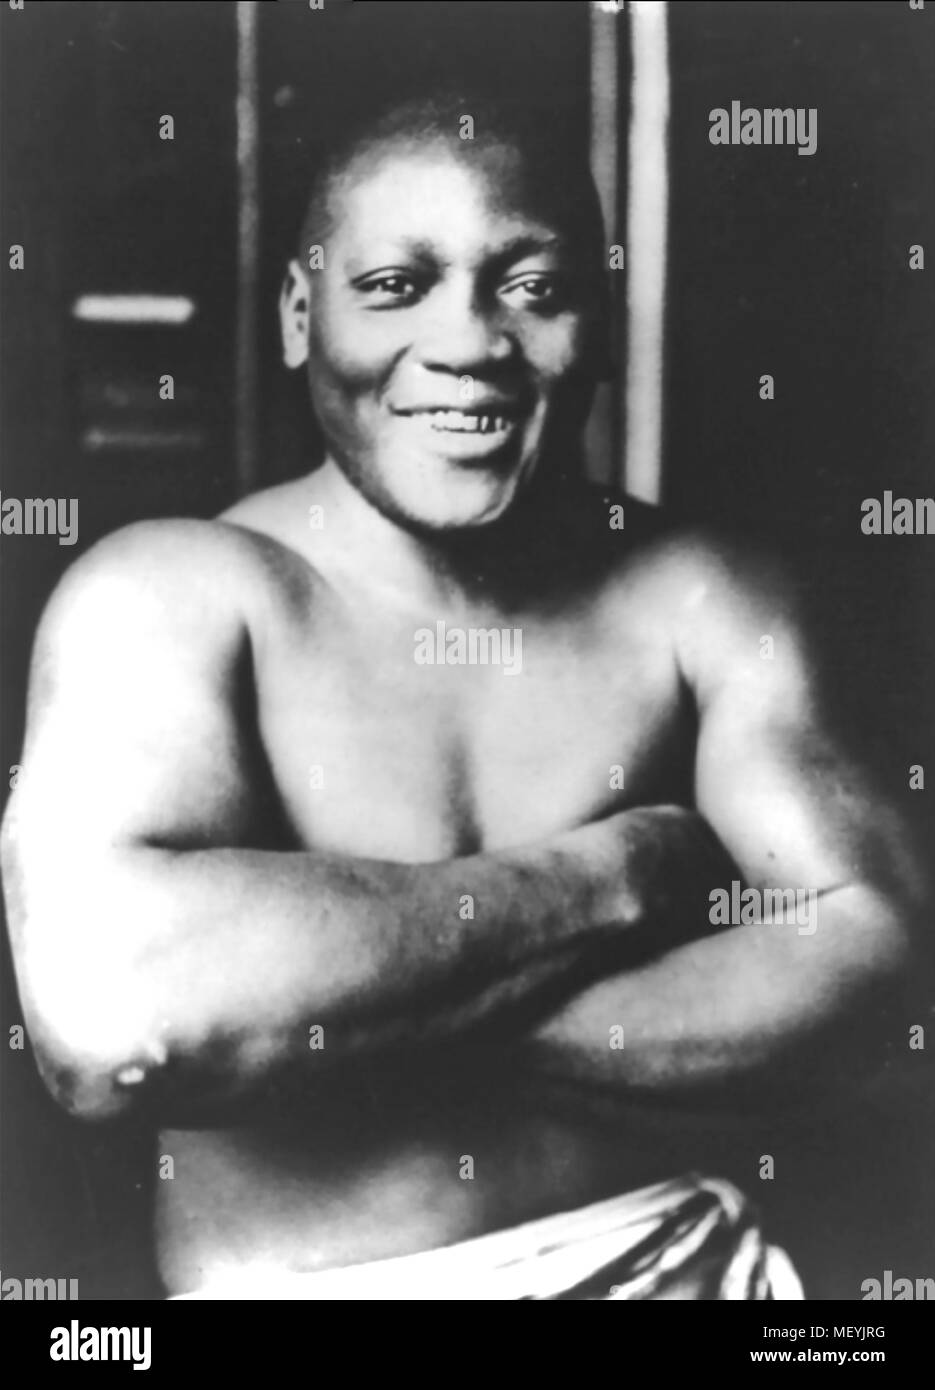 JACK JOHNSON (1878-1946) American boxer who was World Heavyweight Champion 1908-1915). Photo taken 1915 - Stock Image